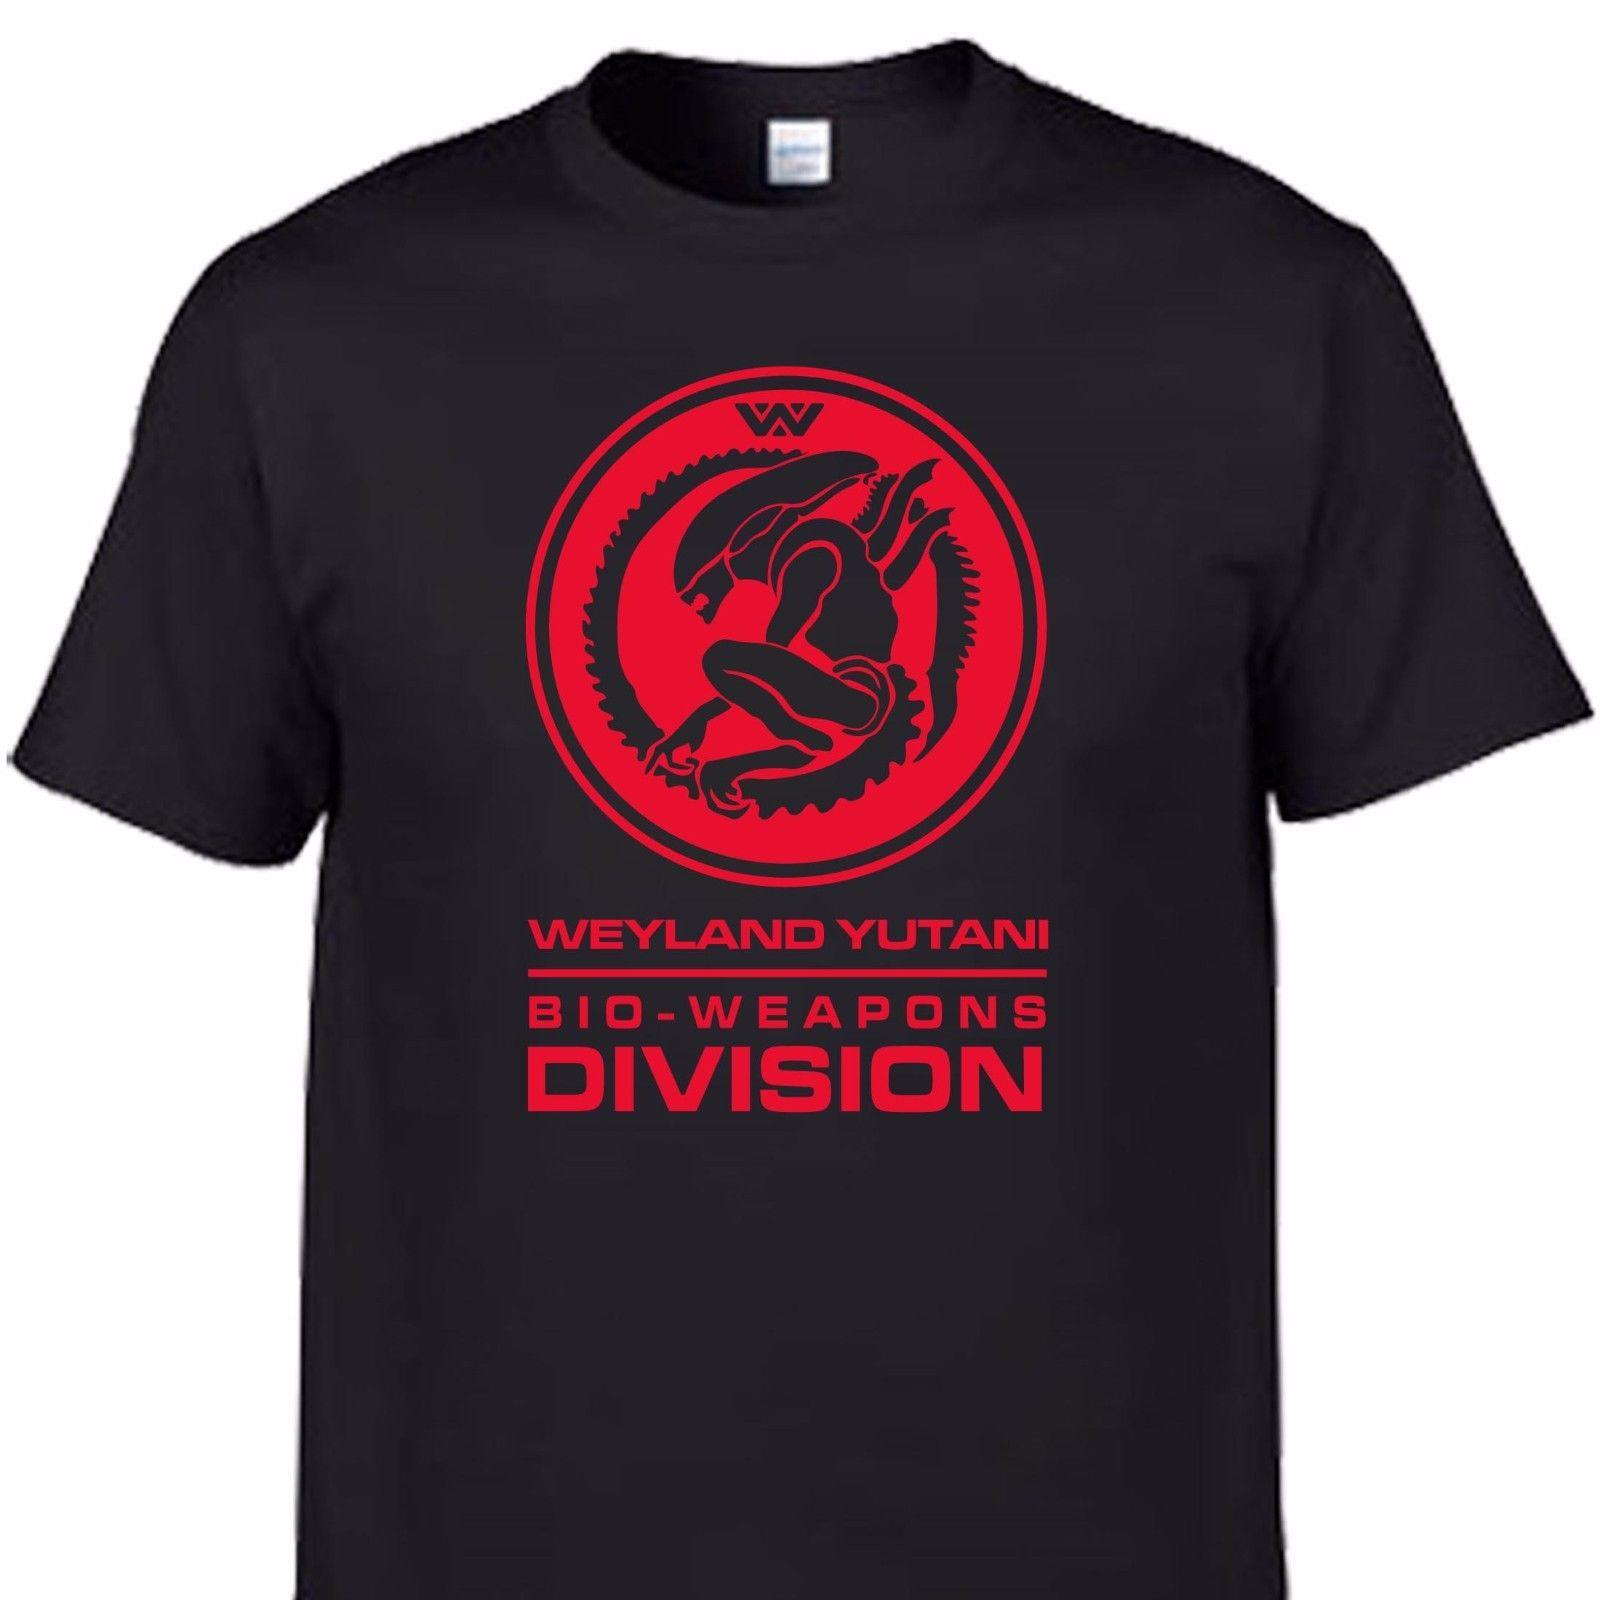 alien movie sci fi cult weyland yutani nostromo prometheus covenant   t     shirt   teeMen'S   T  -  Shirts   Summer Style Fashion Swag Men